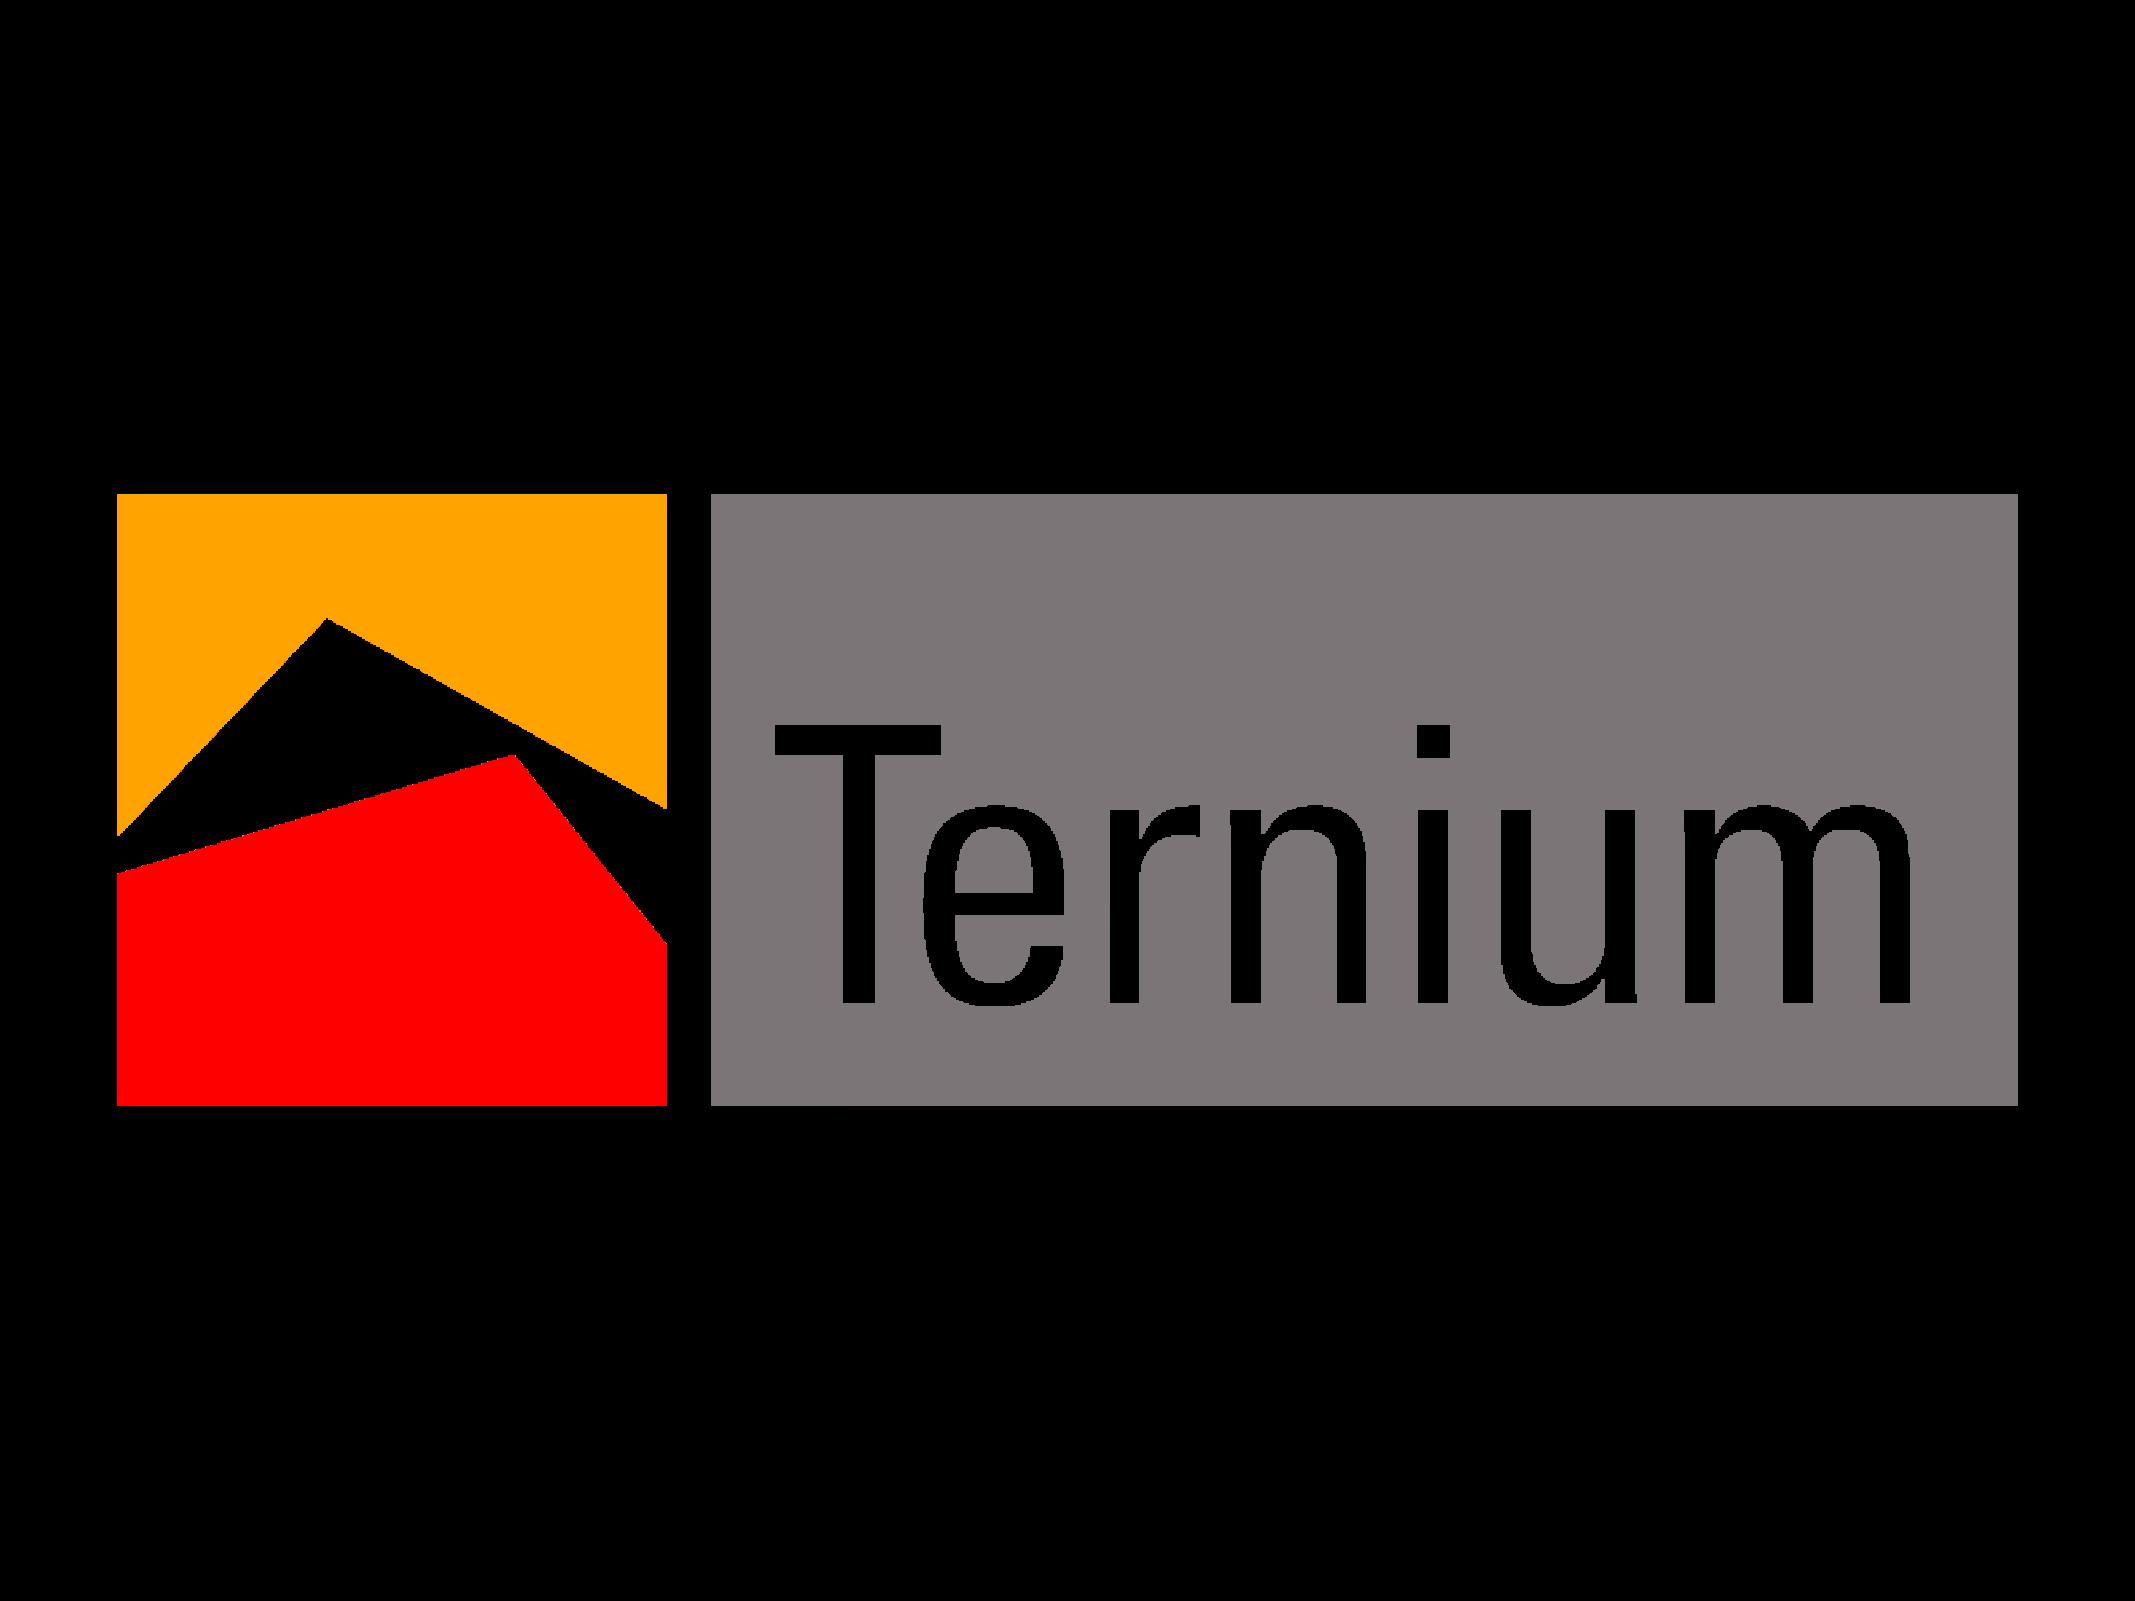 logo-clientes-ternium